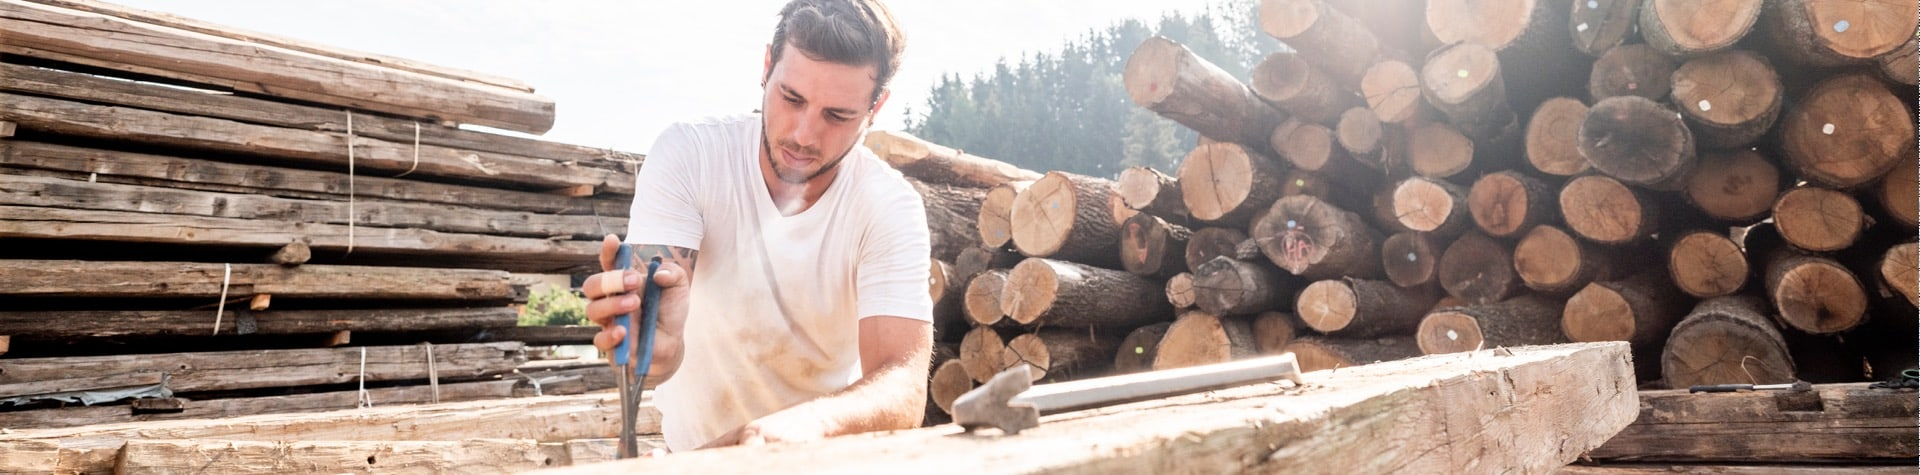 Altholz reinigen